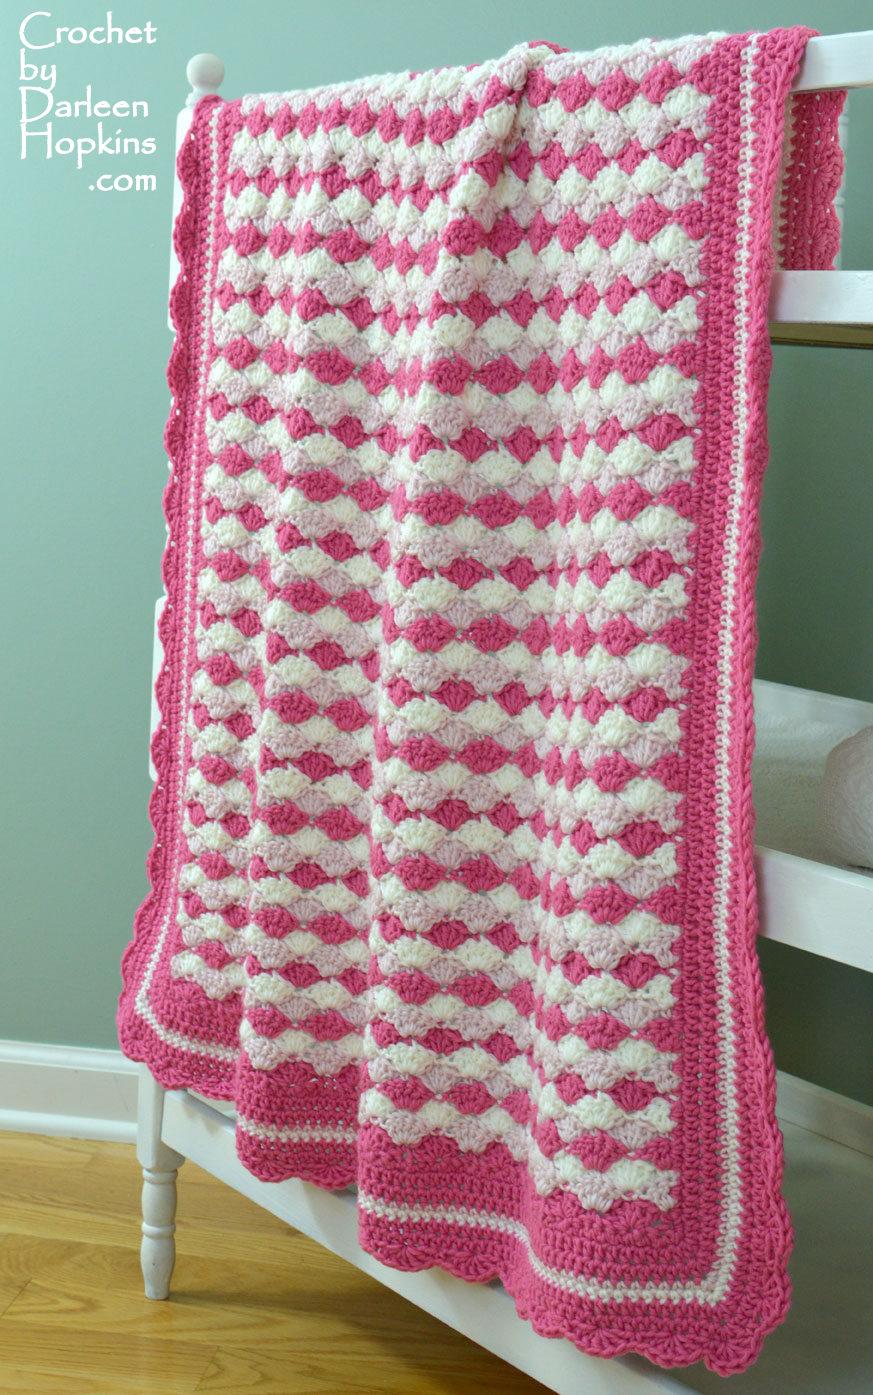 Baby Blanket Shells Of Love Crochet By Darleen Hopkins